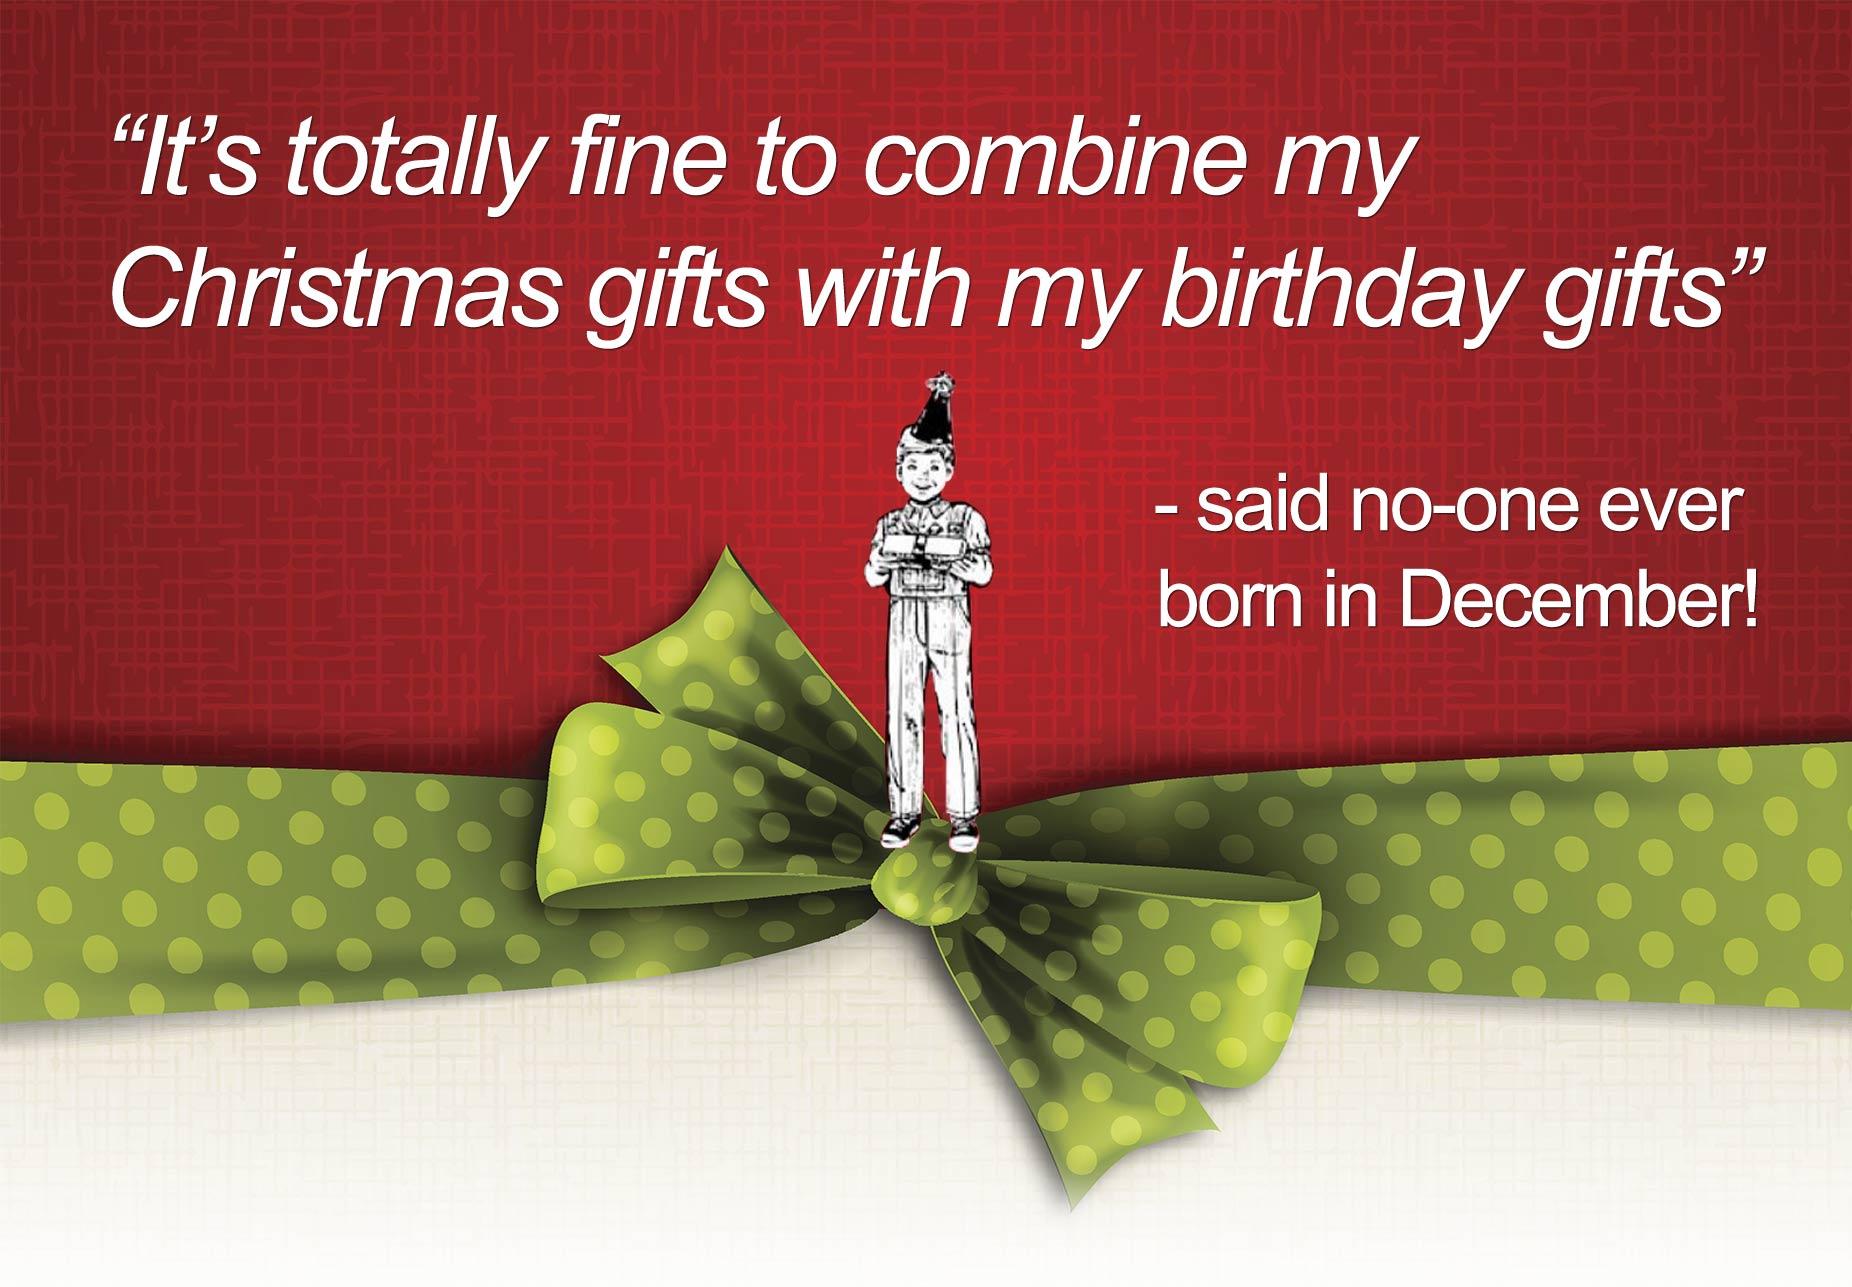 December birthday? Bitter or Sweet? - Ardmore Advertising